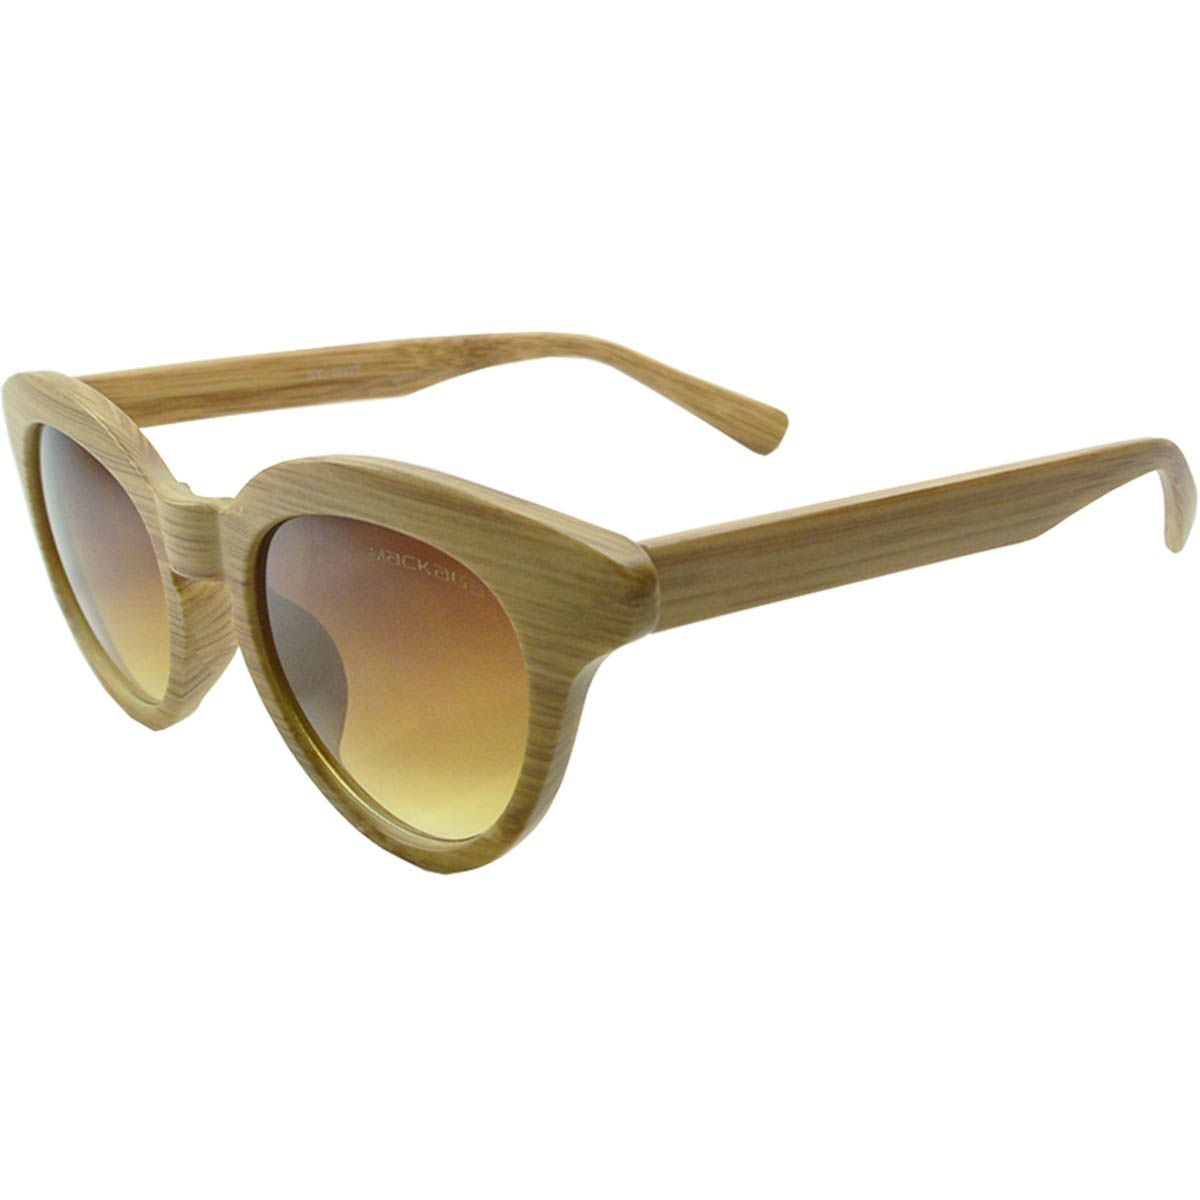 Óculos de Sol Feminino Mackage MK40177M Marfim